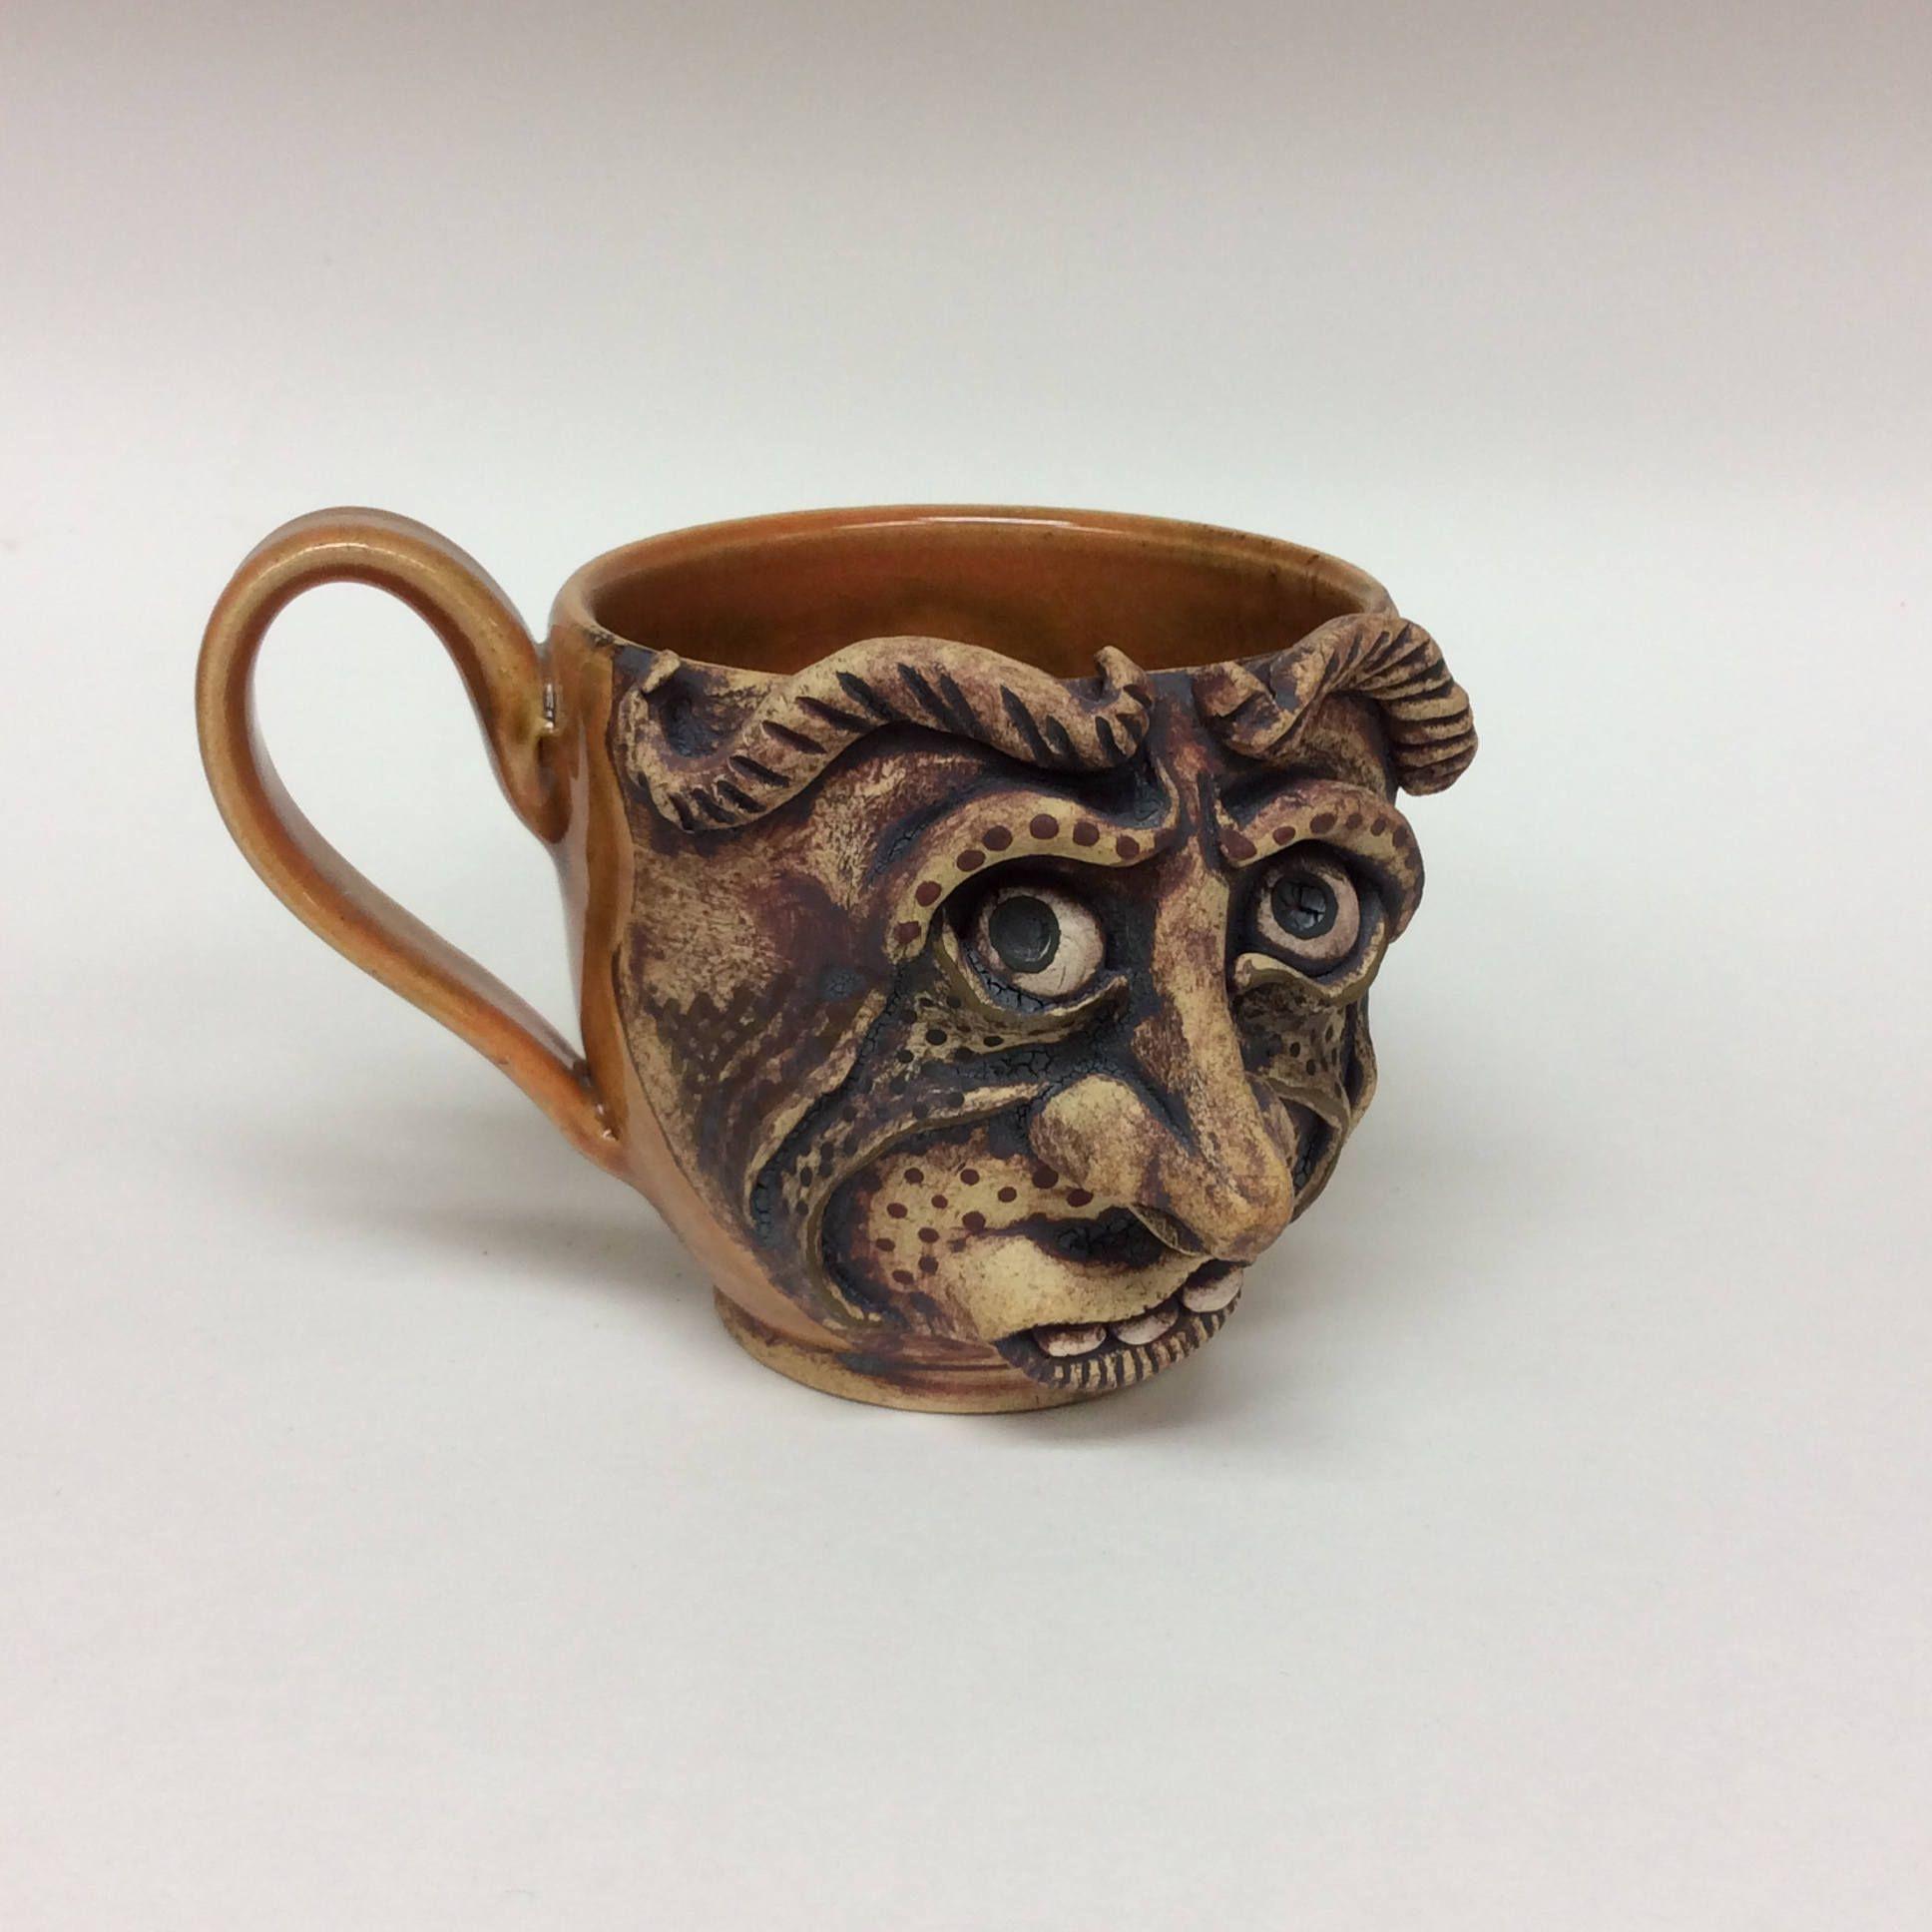 Face mug ceramic face mug ceramic coffee cup handmade cup